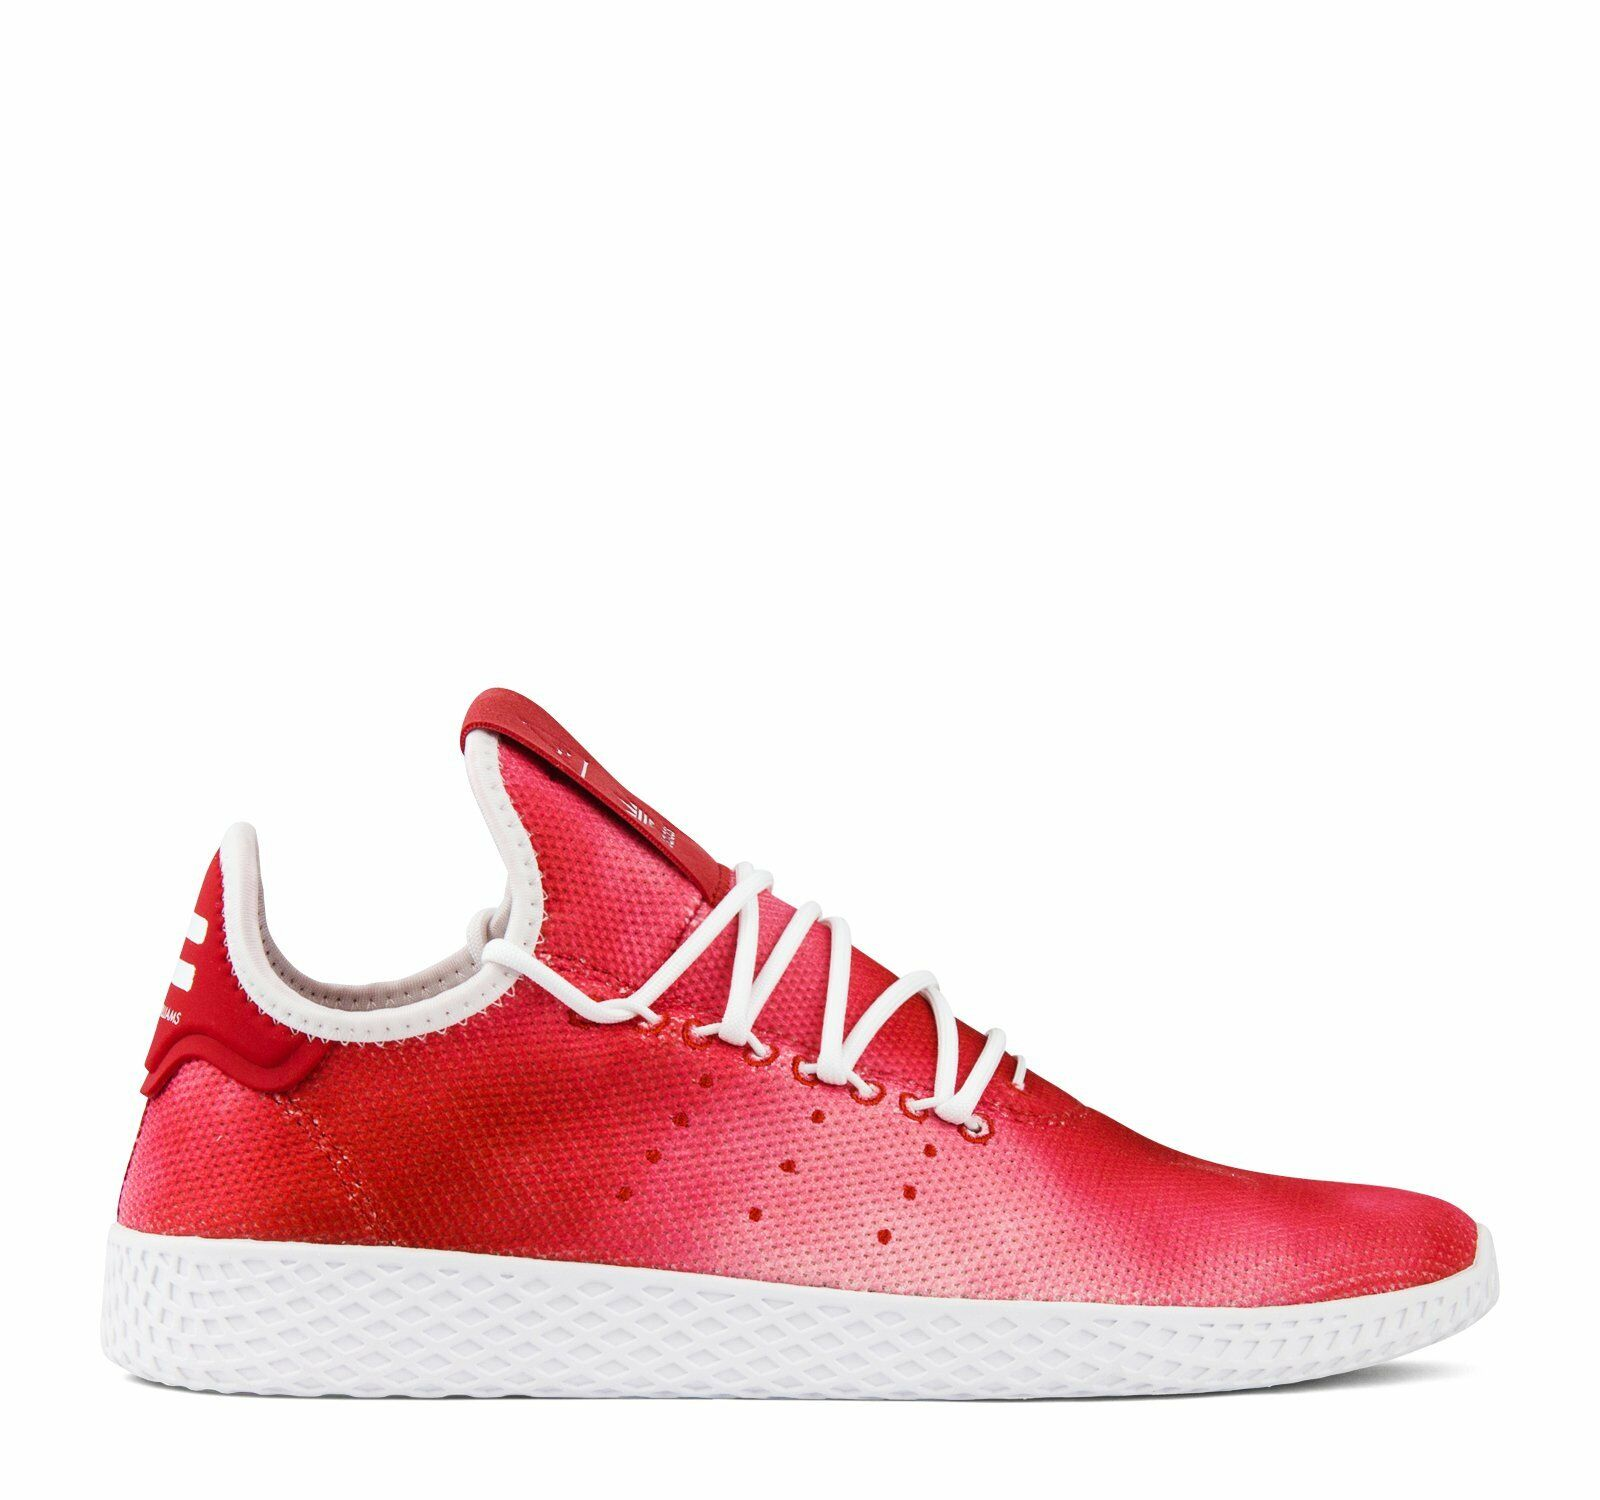 Adidas Original Tennis Hu  Pharrell Williams  NEW AUTHENTIC Red White DA9615